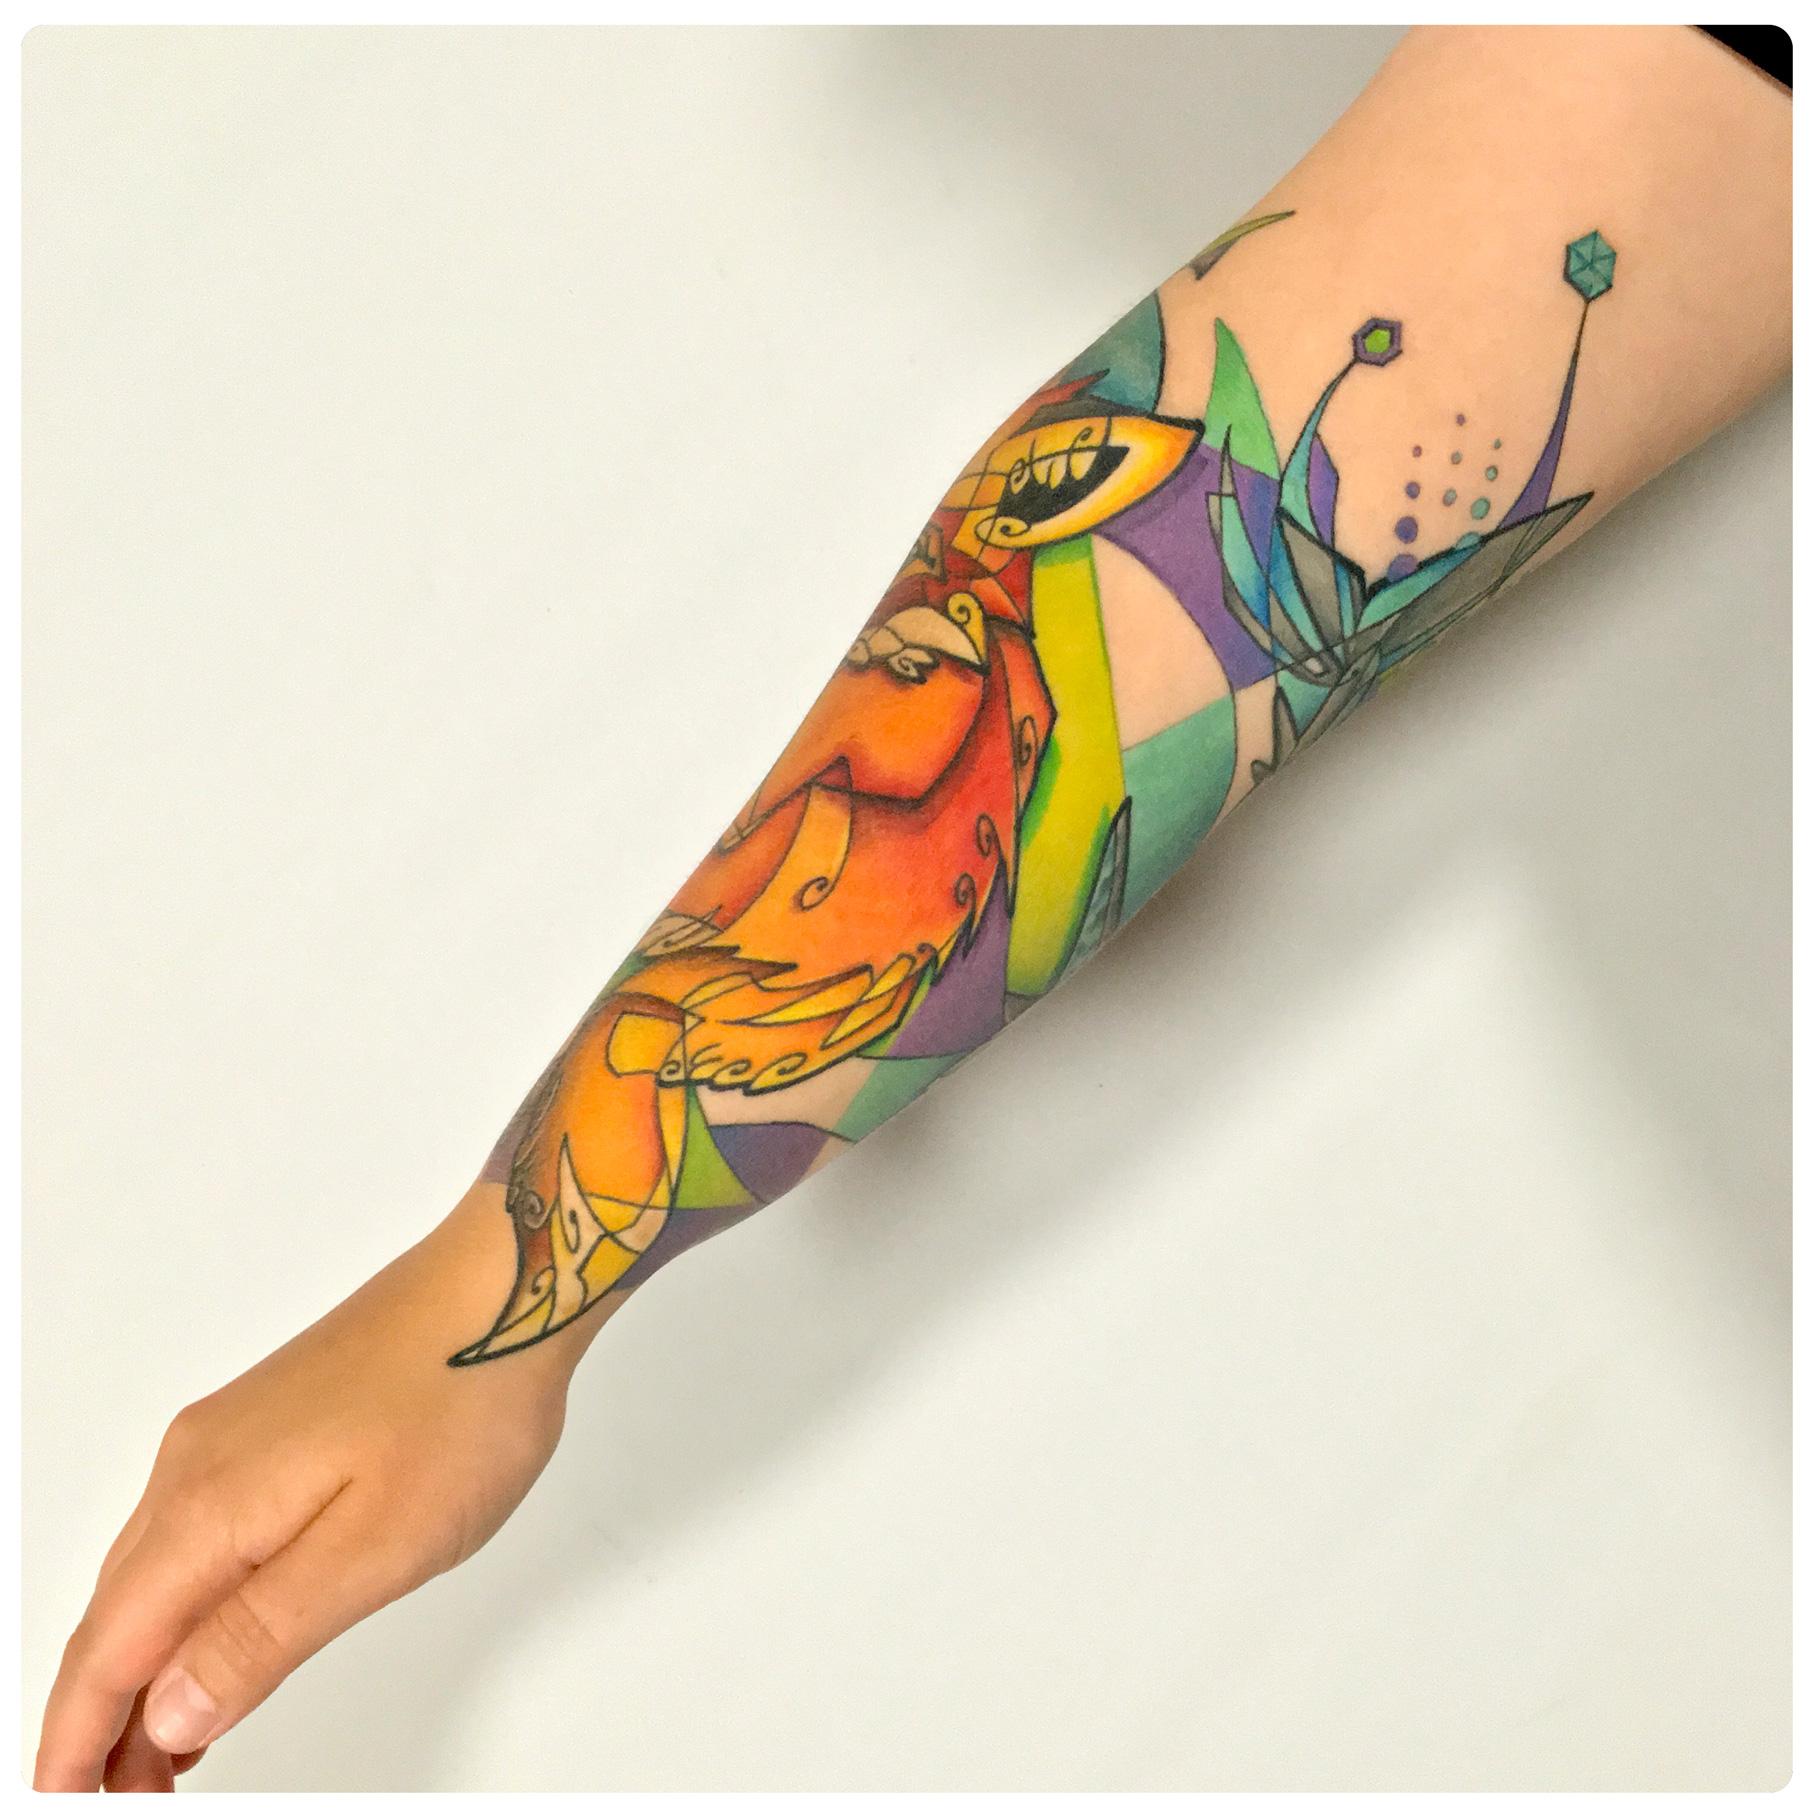 web-3_2016_tattoo_forearm_fox-shark-abstract.jpg